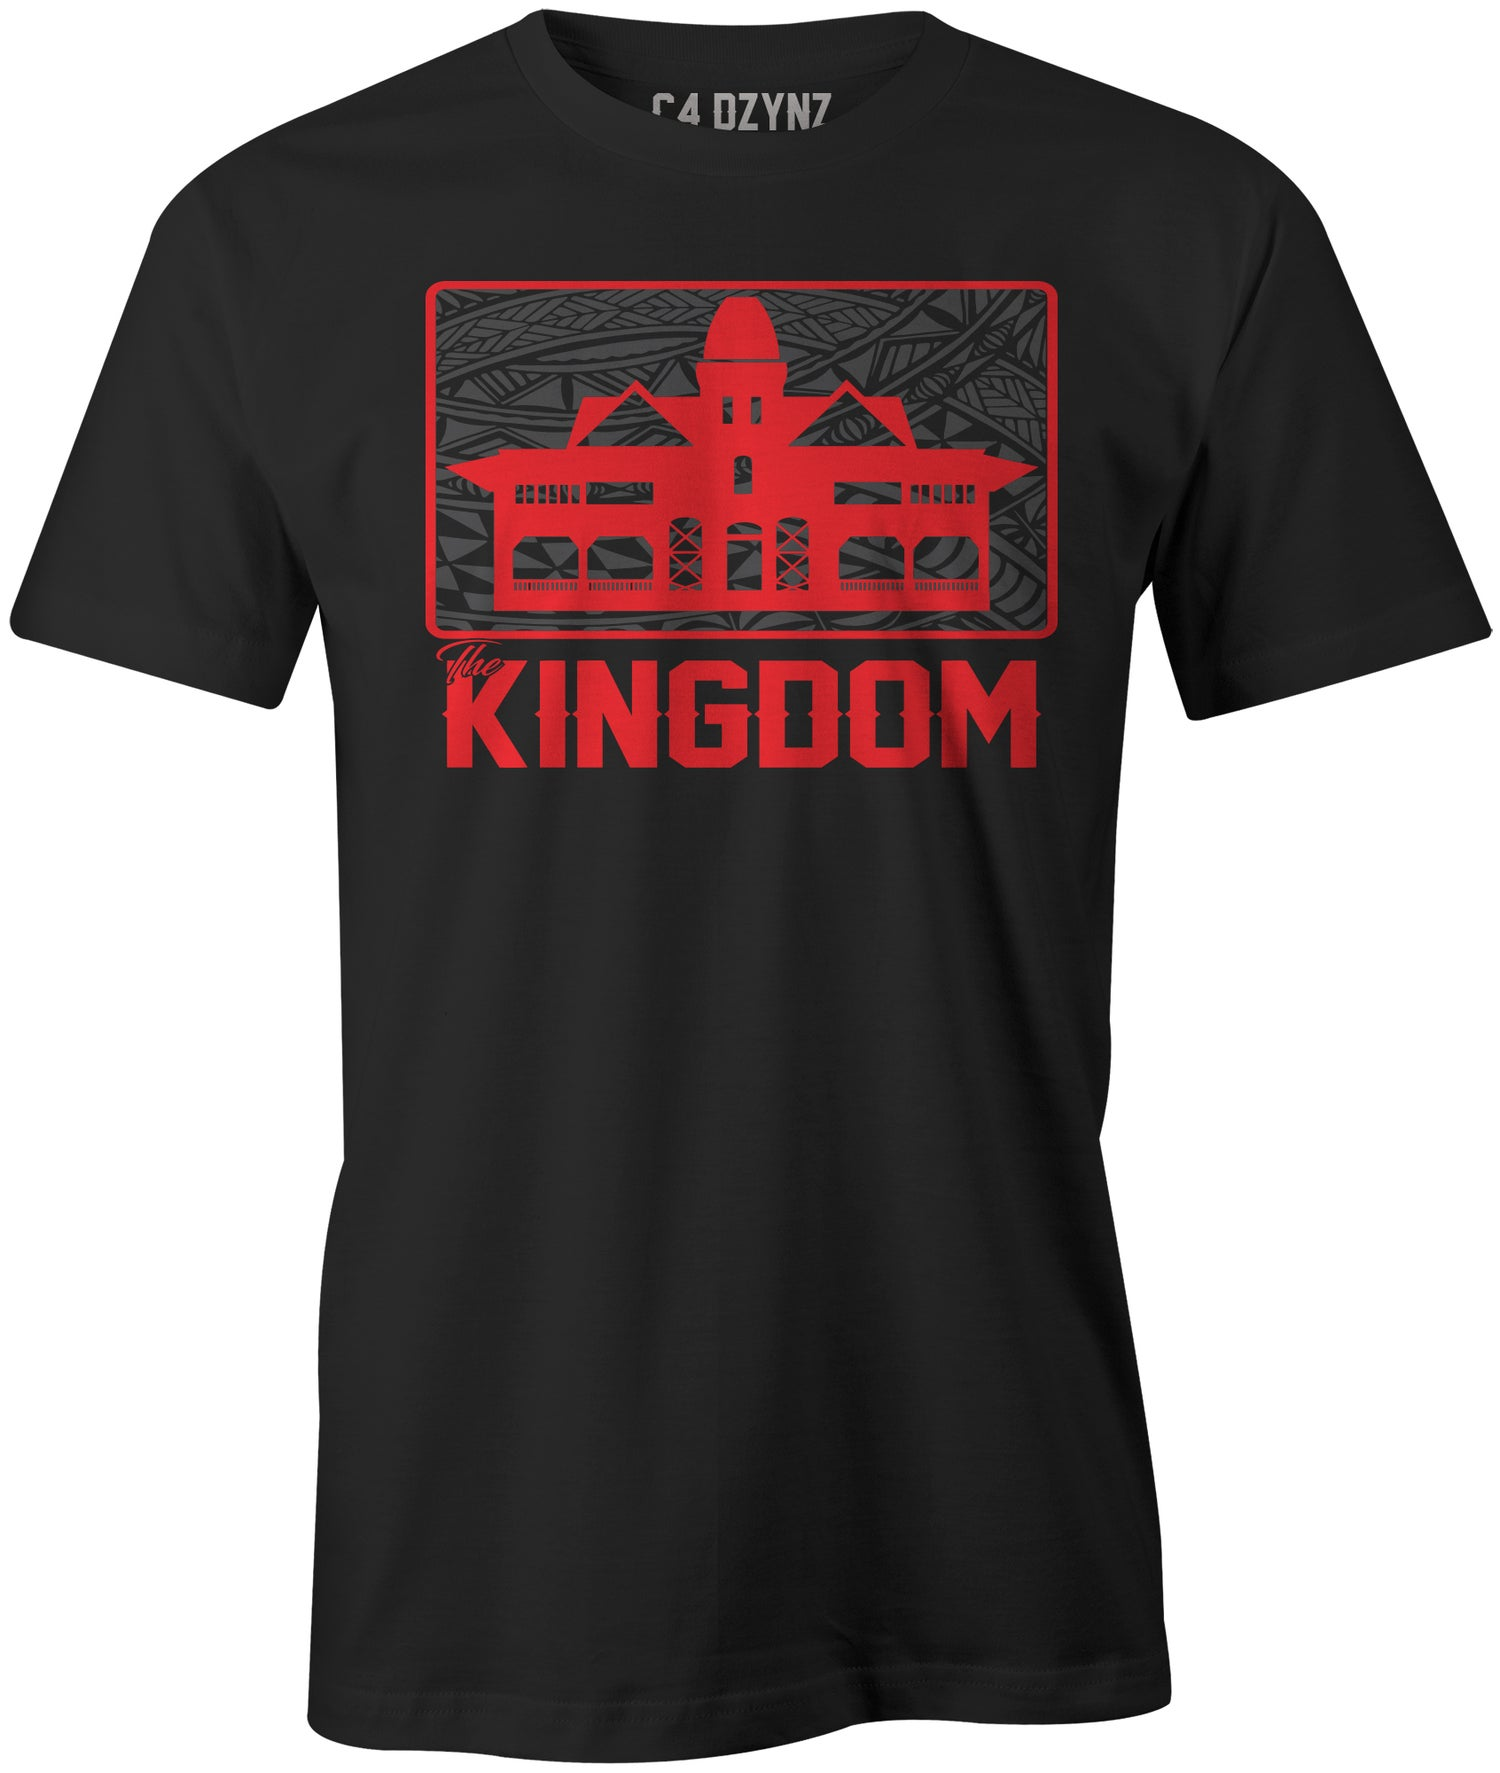 Image of The Kingdom Tee